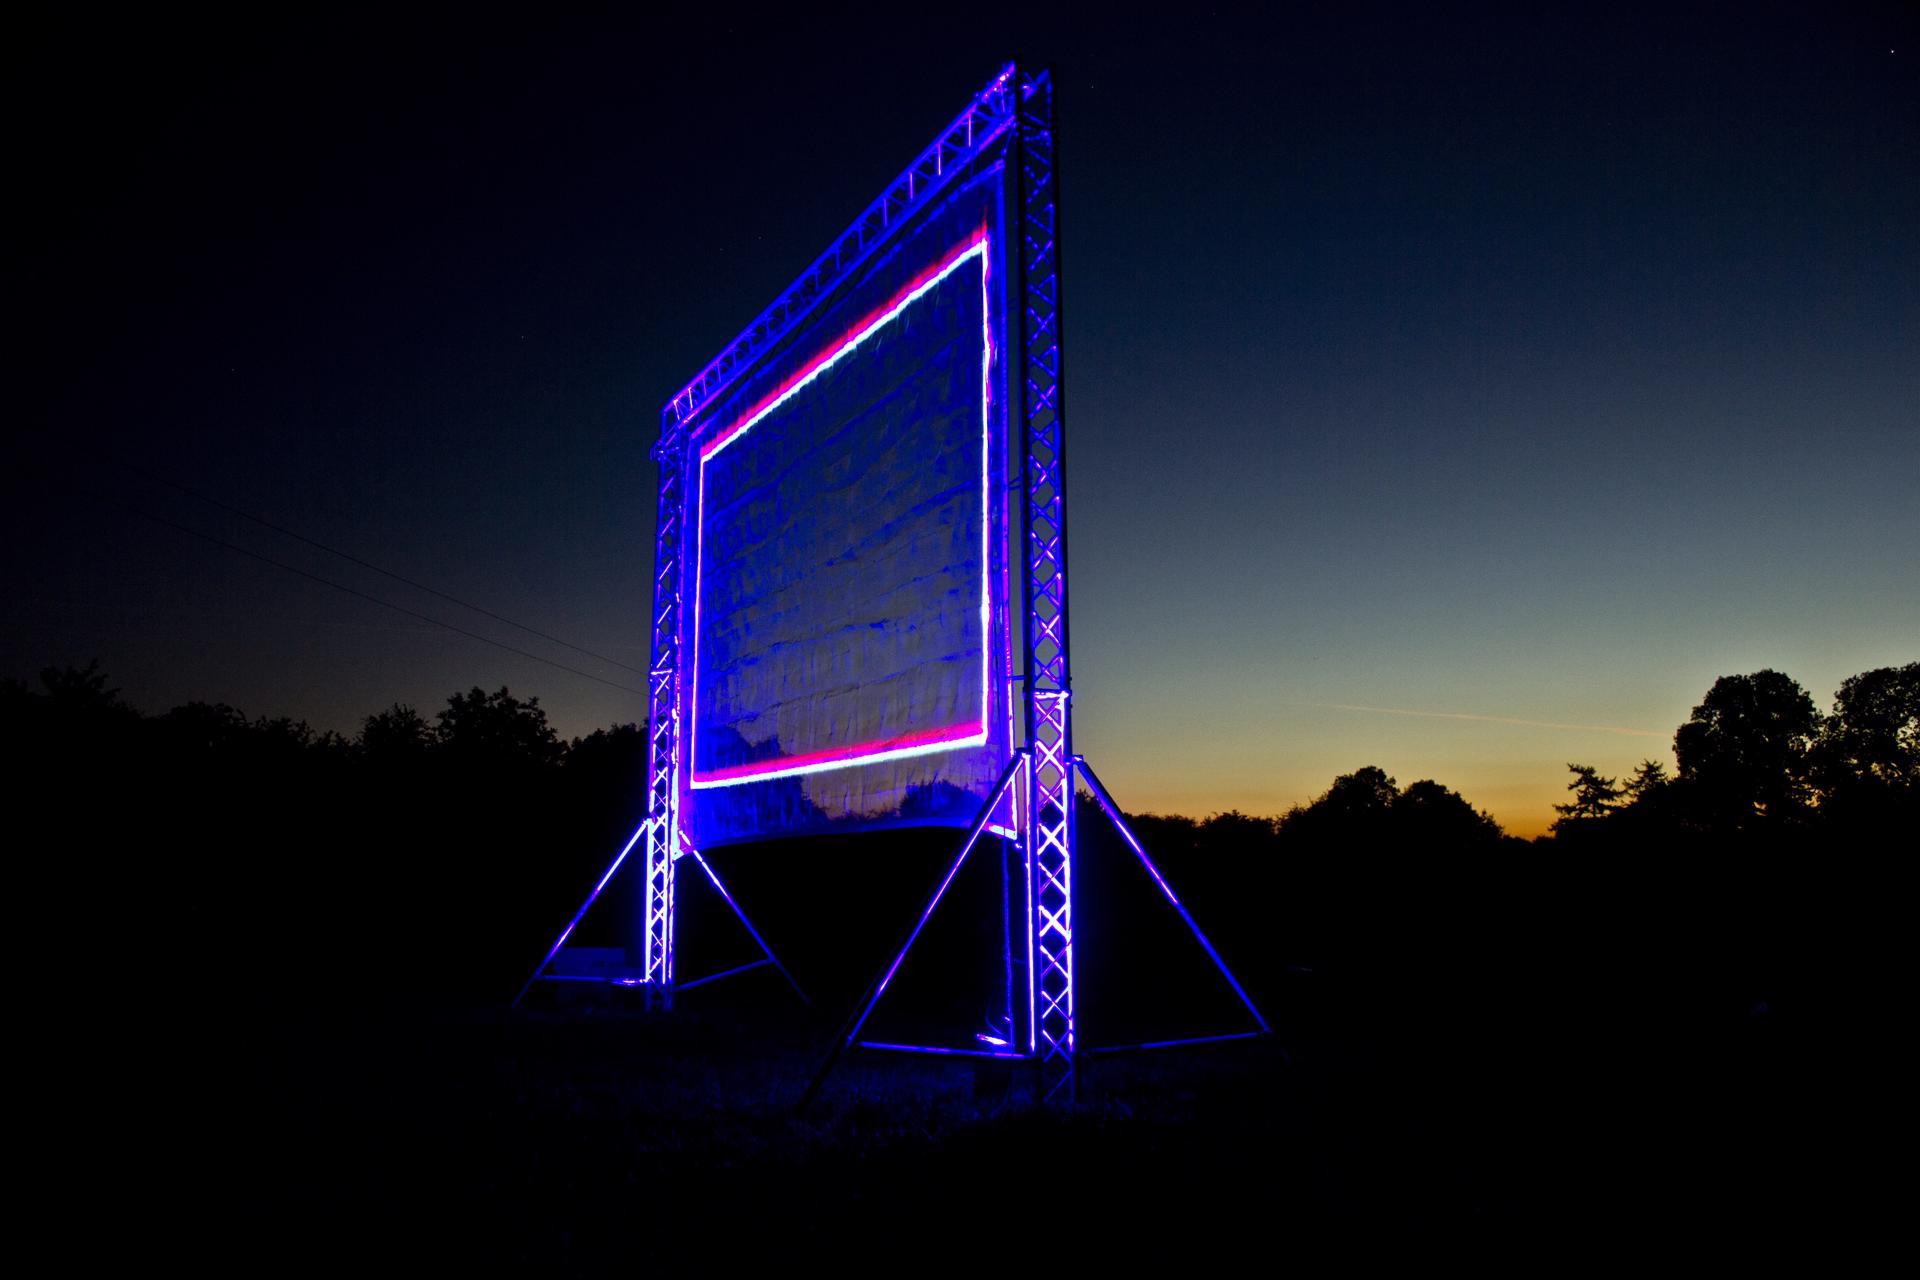 5m-high-laser-screen_21970683046_o-1920x1280.jpg